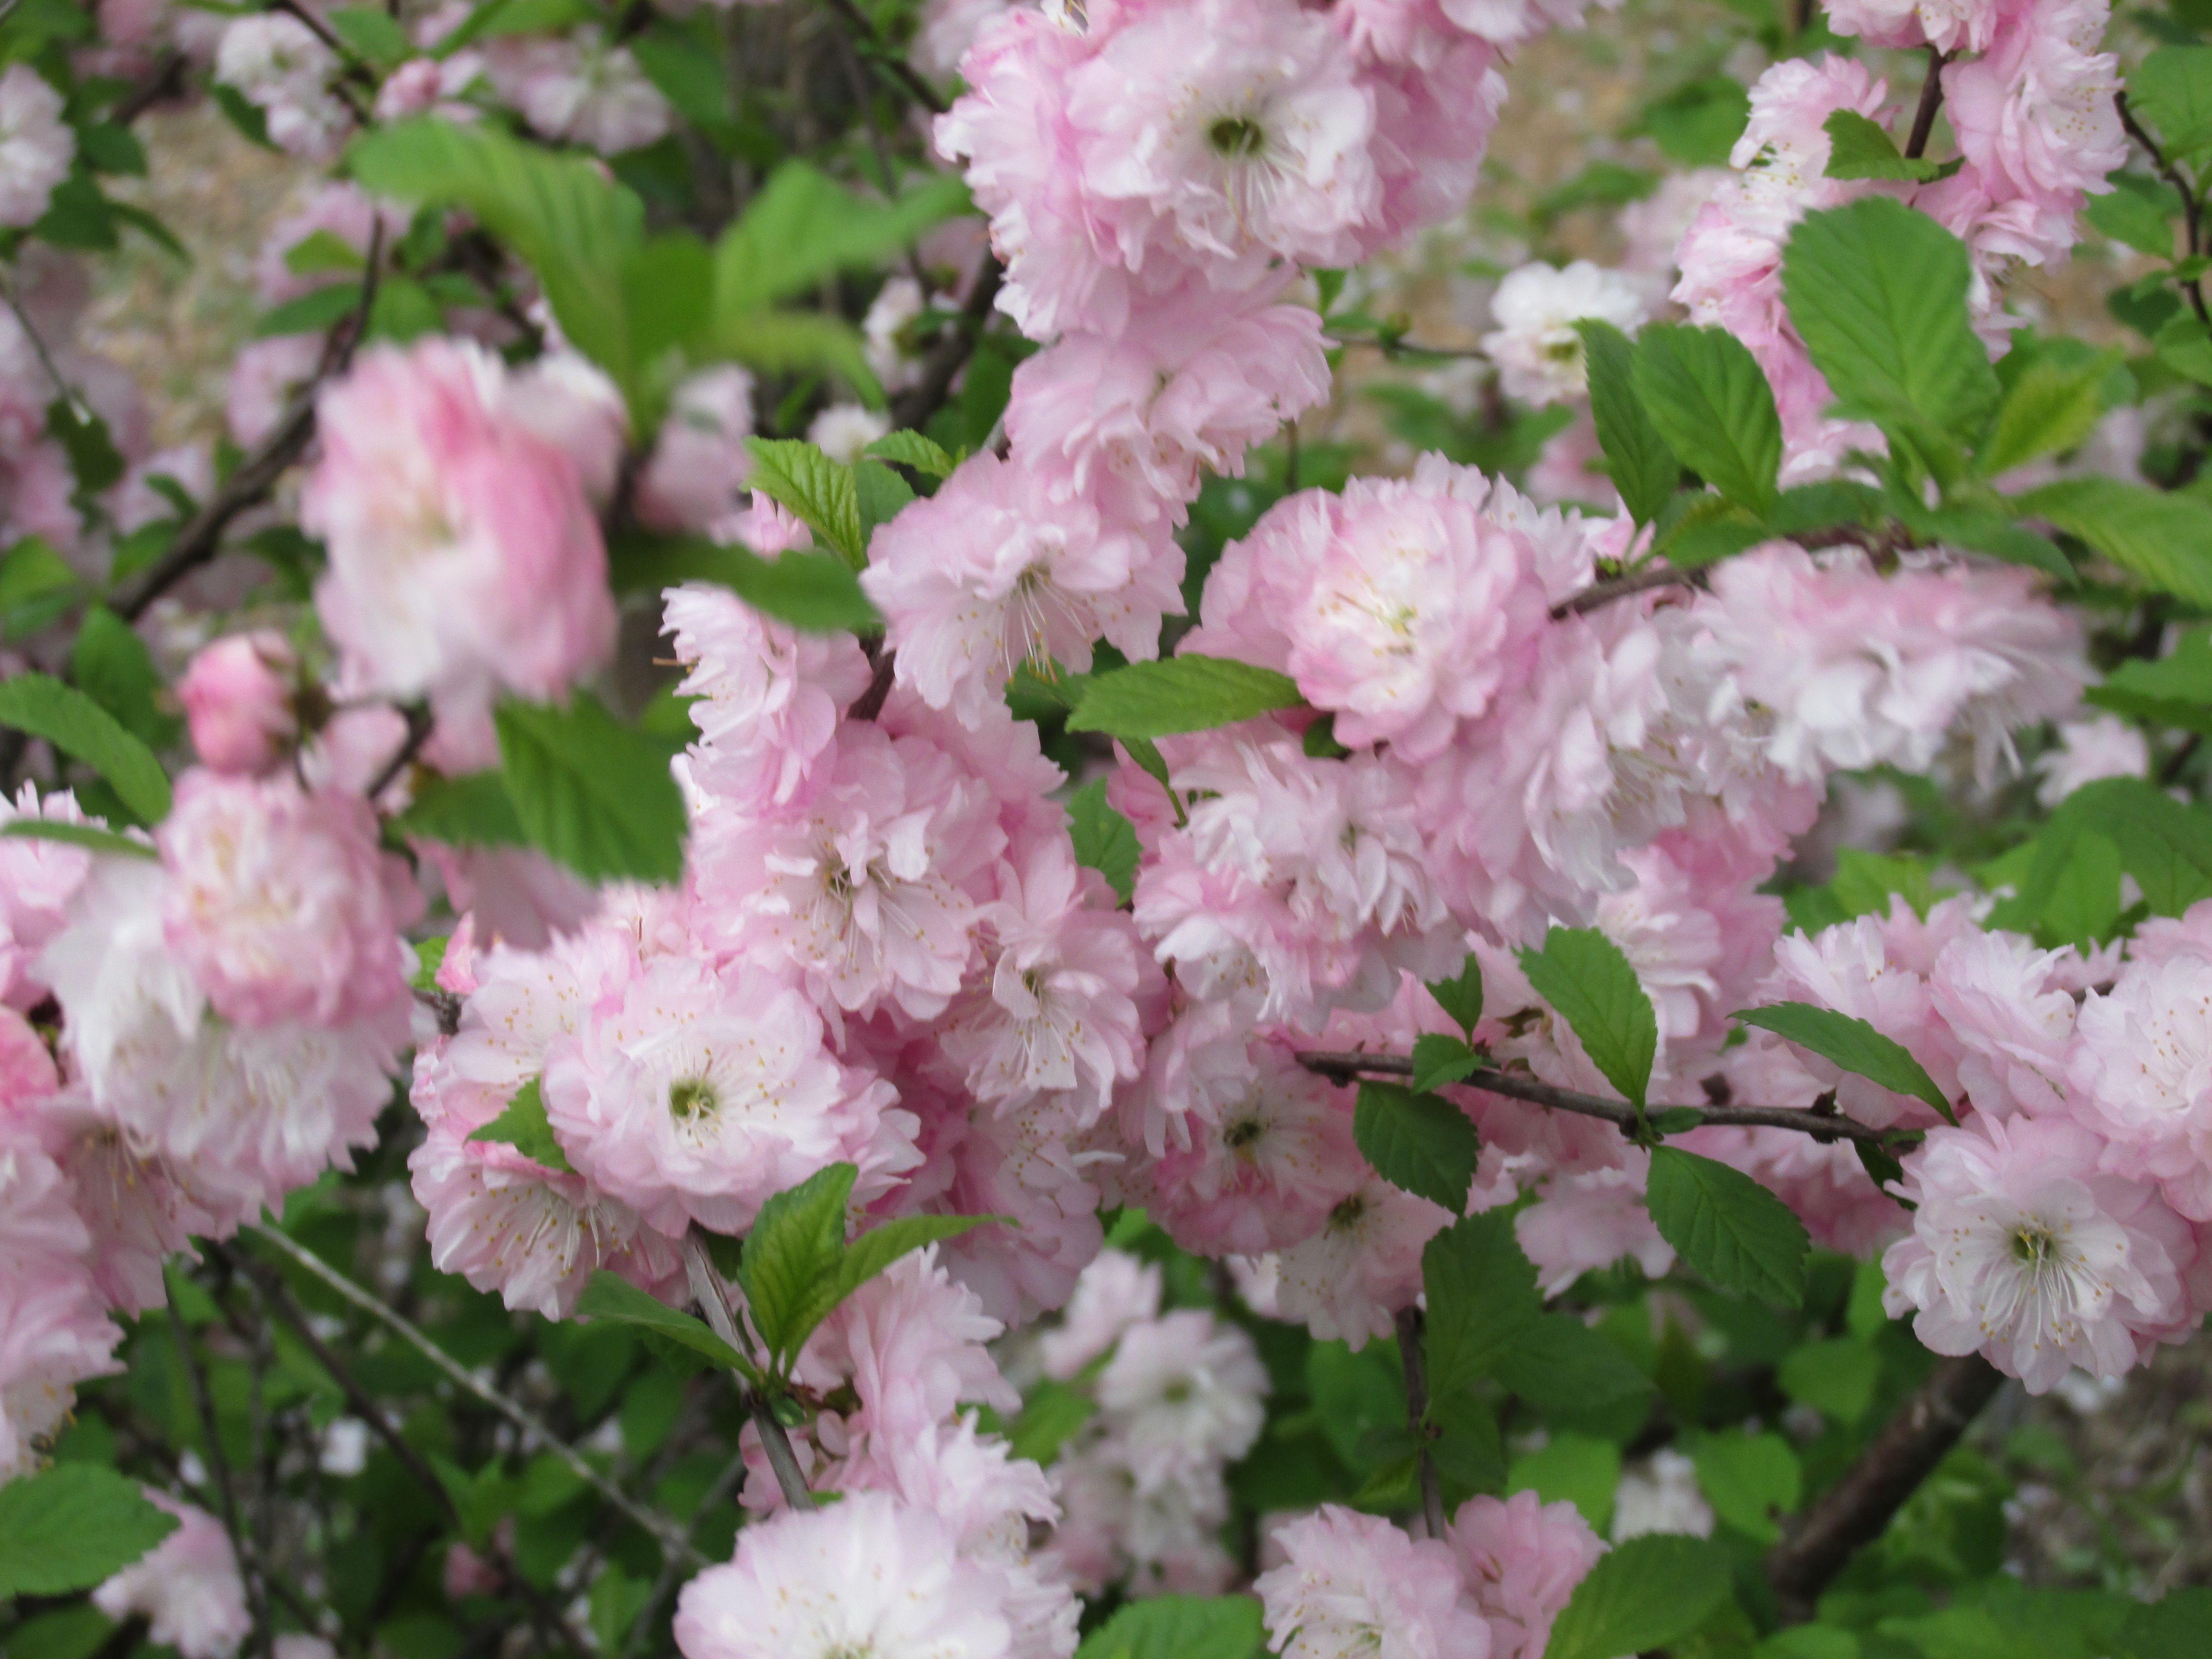 Flowering Almond Bush Home